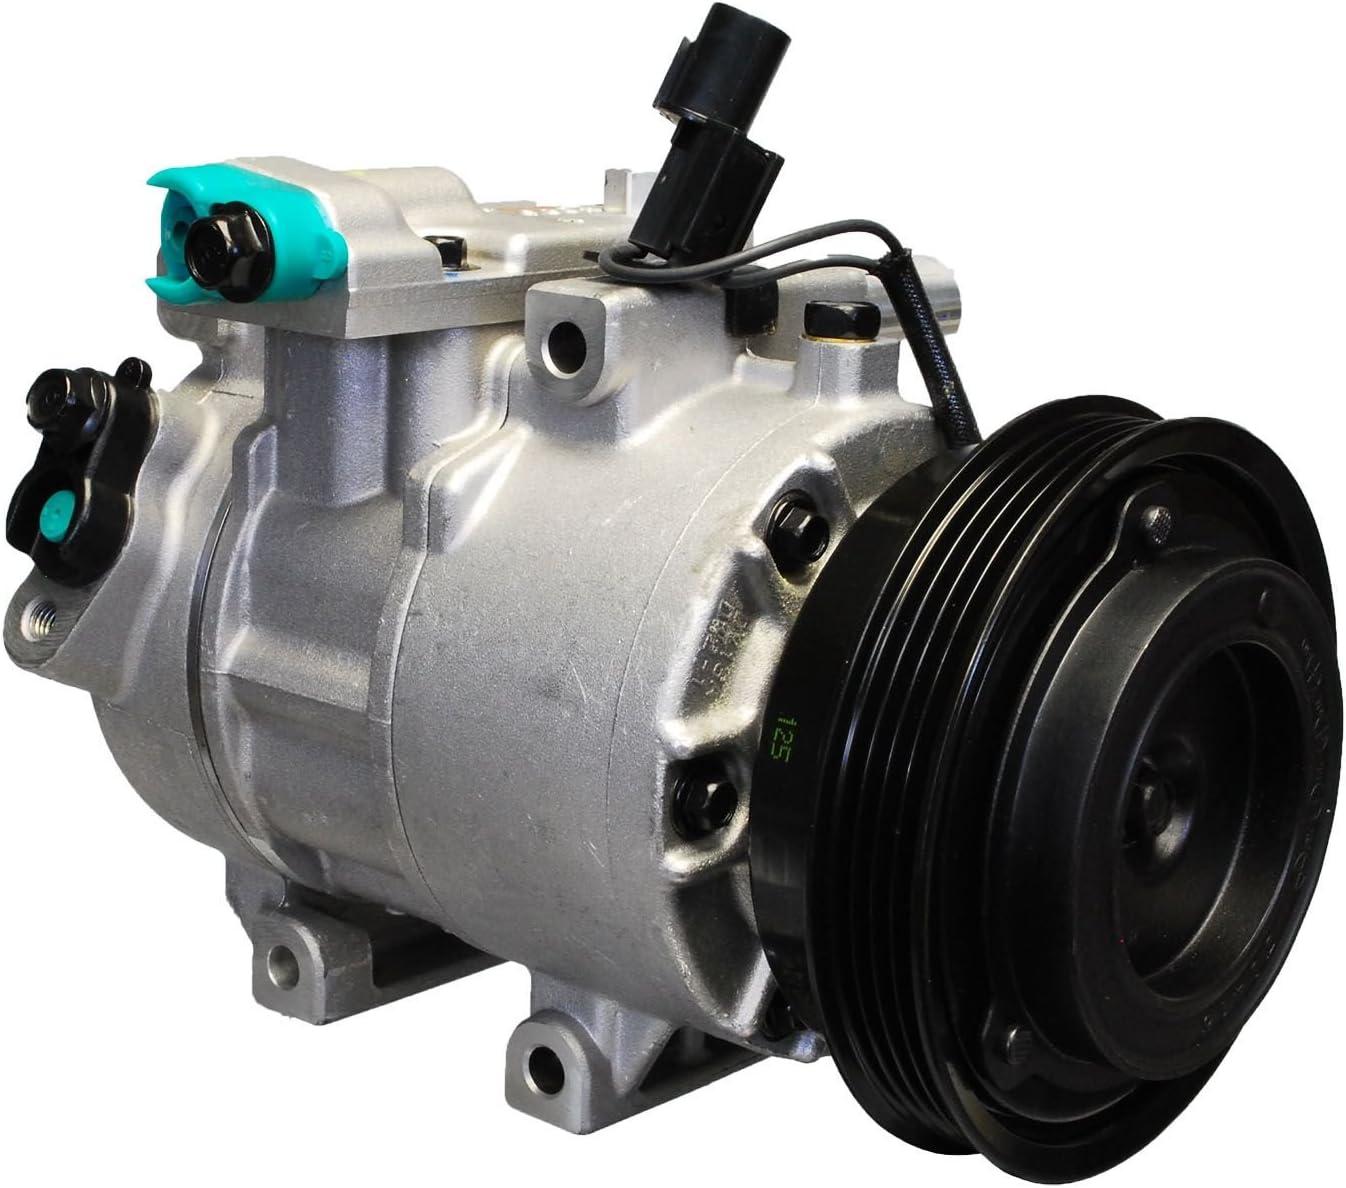 AC Compressor /& A//C Clutch For Kia Spectra Spectra5 2.0L 2007 2008 2009 BuyAutoParts 60-02416NA NEW